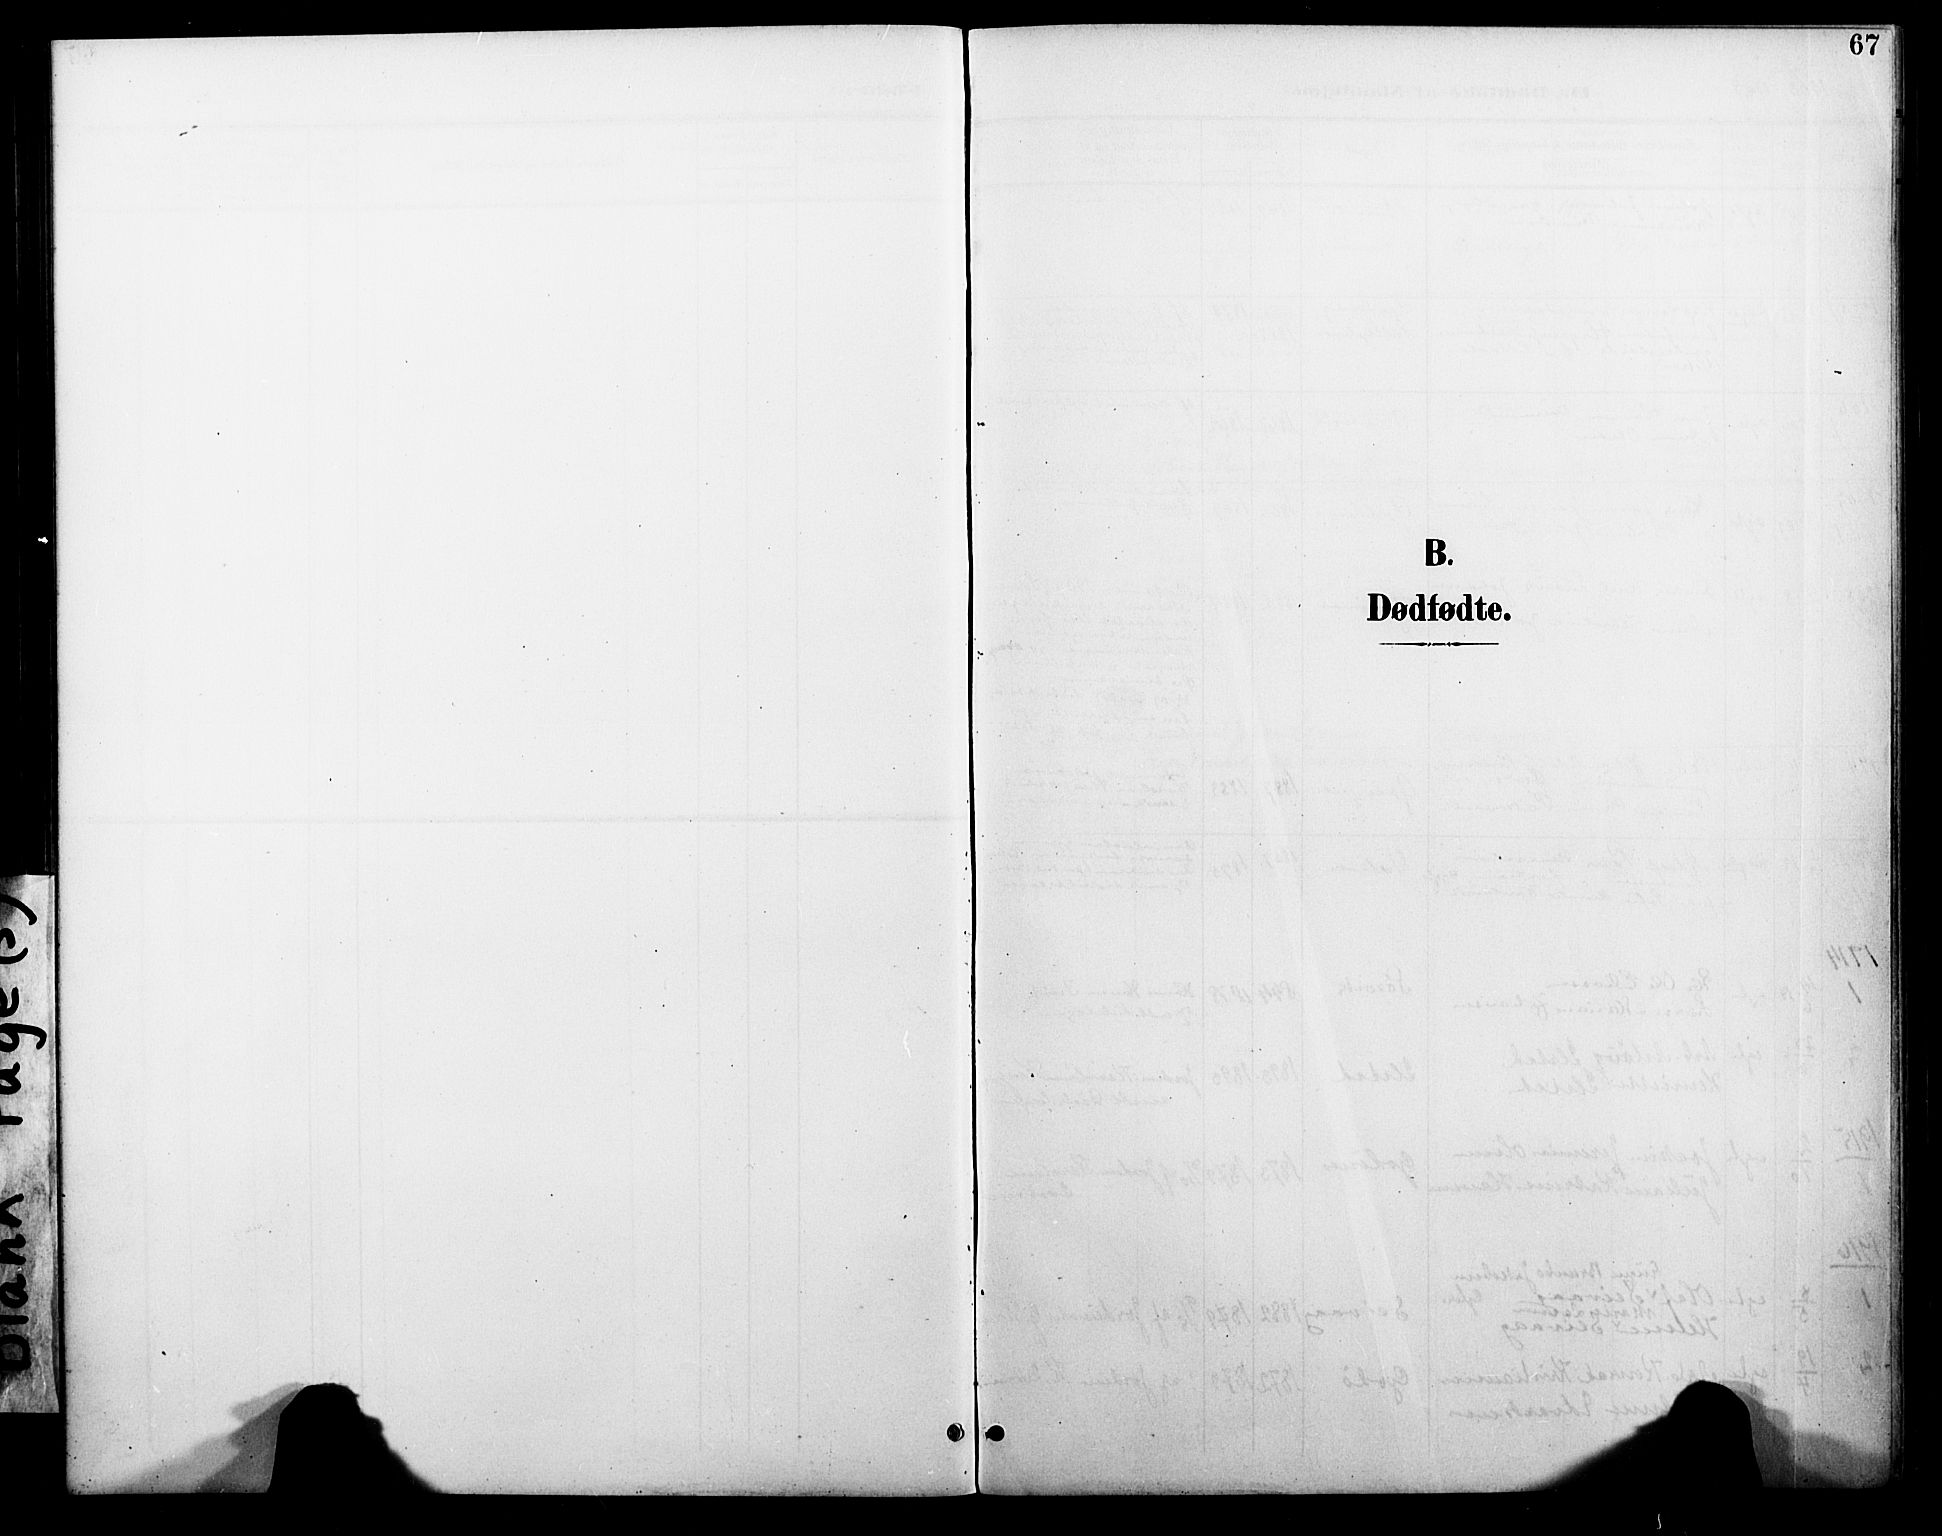 SAT, Ministerialprotokoller, klokkerbøker og fødselsregistre - Nordland, 804/L0088: Klokkerbok nr. 804C01, 1901-1917, s. 67